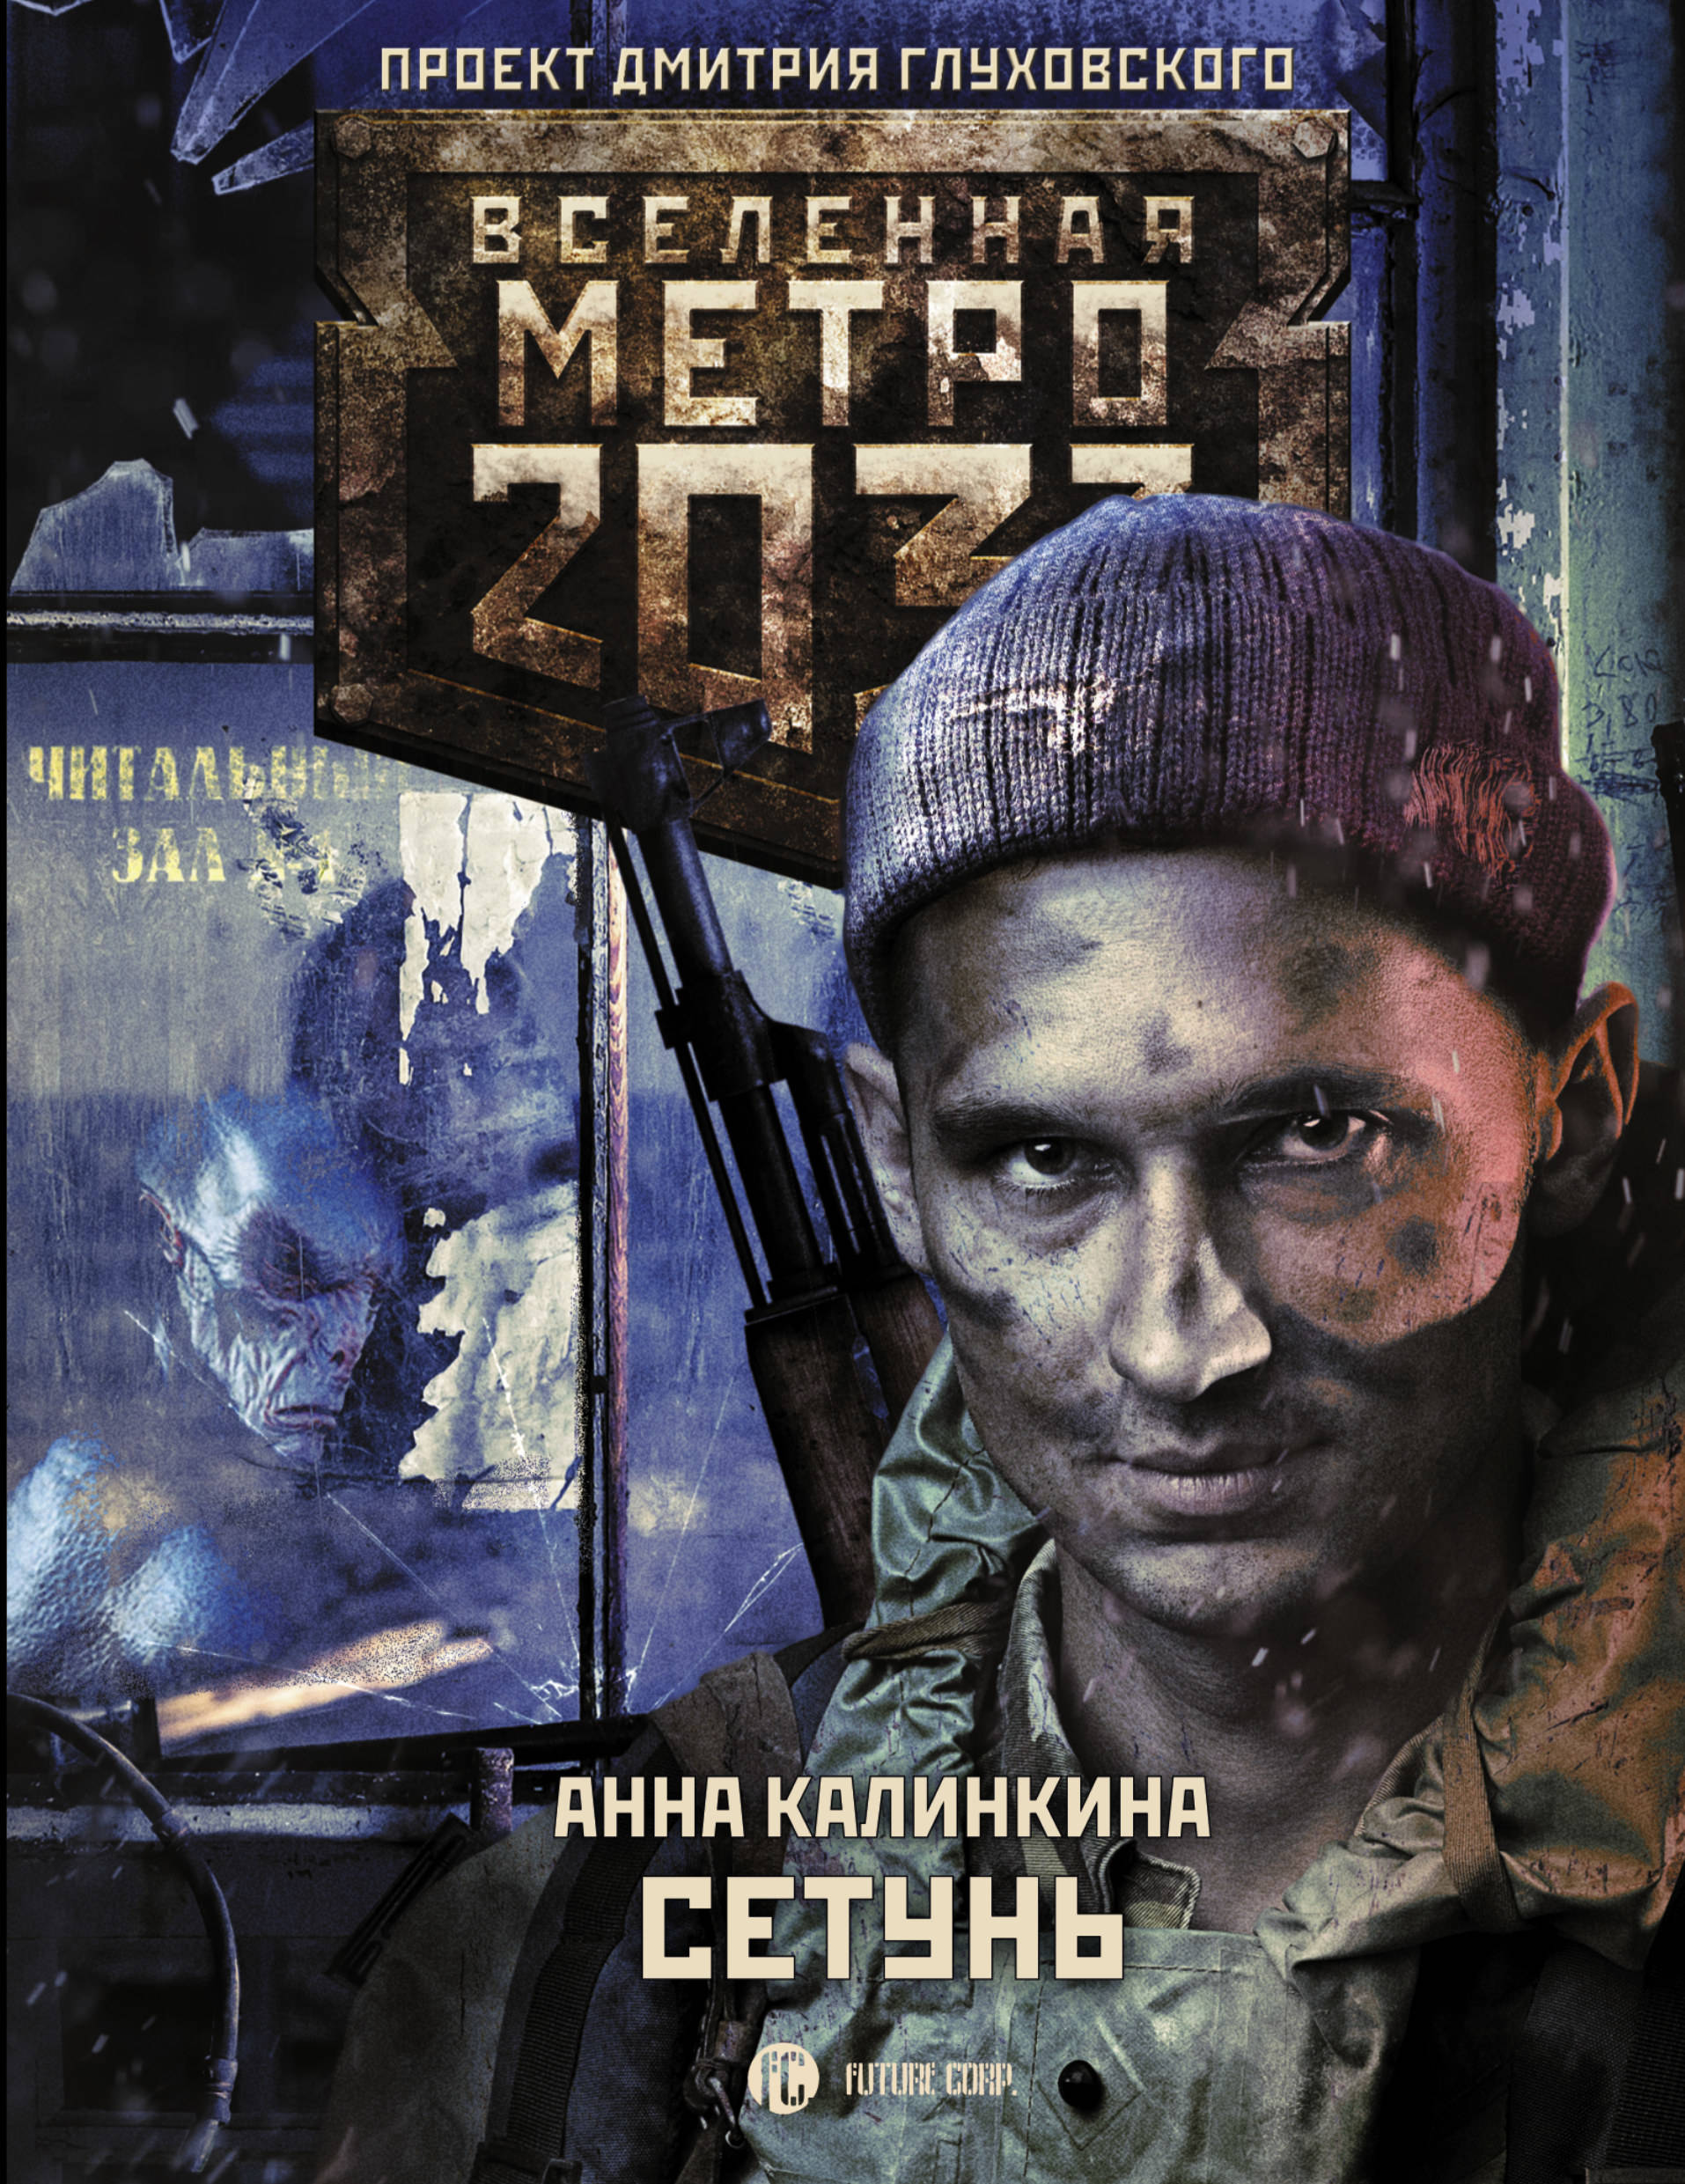 Metro 2033: Setun